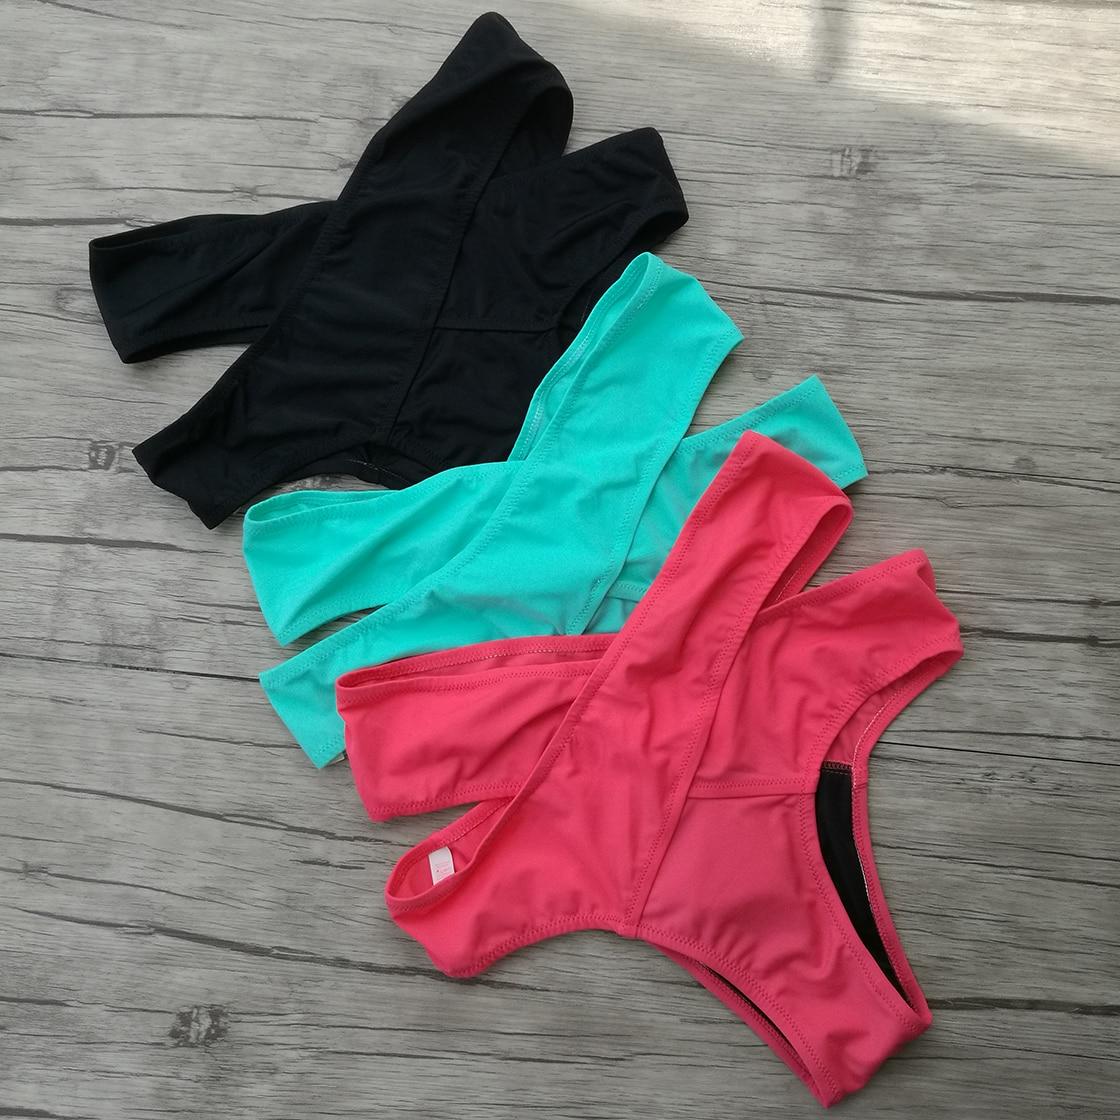 Women's Sexy Bikini sets Black Red Bikinis Top Women Bikini Bottoms Swimwear Green Secret Brazilian High Waist Bottom 1